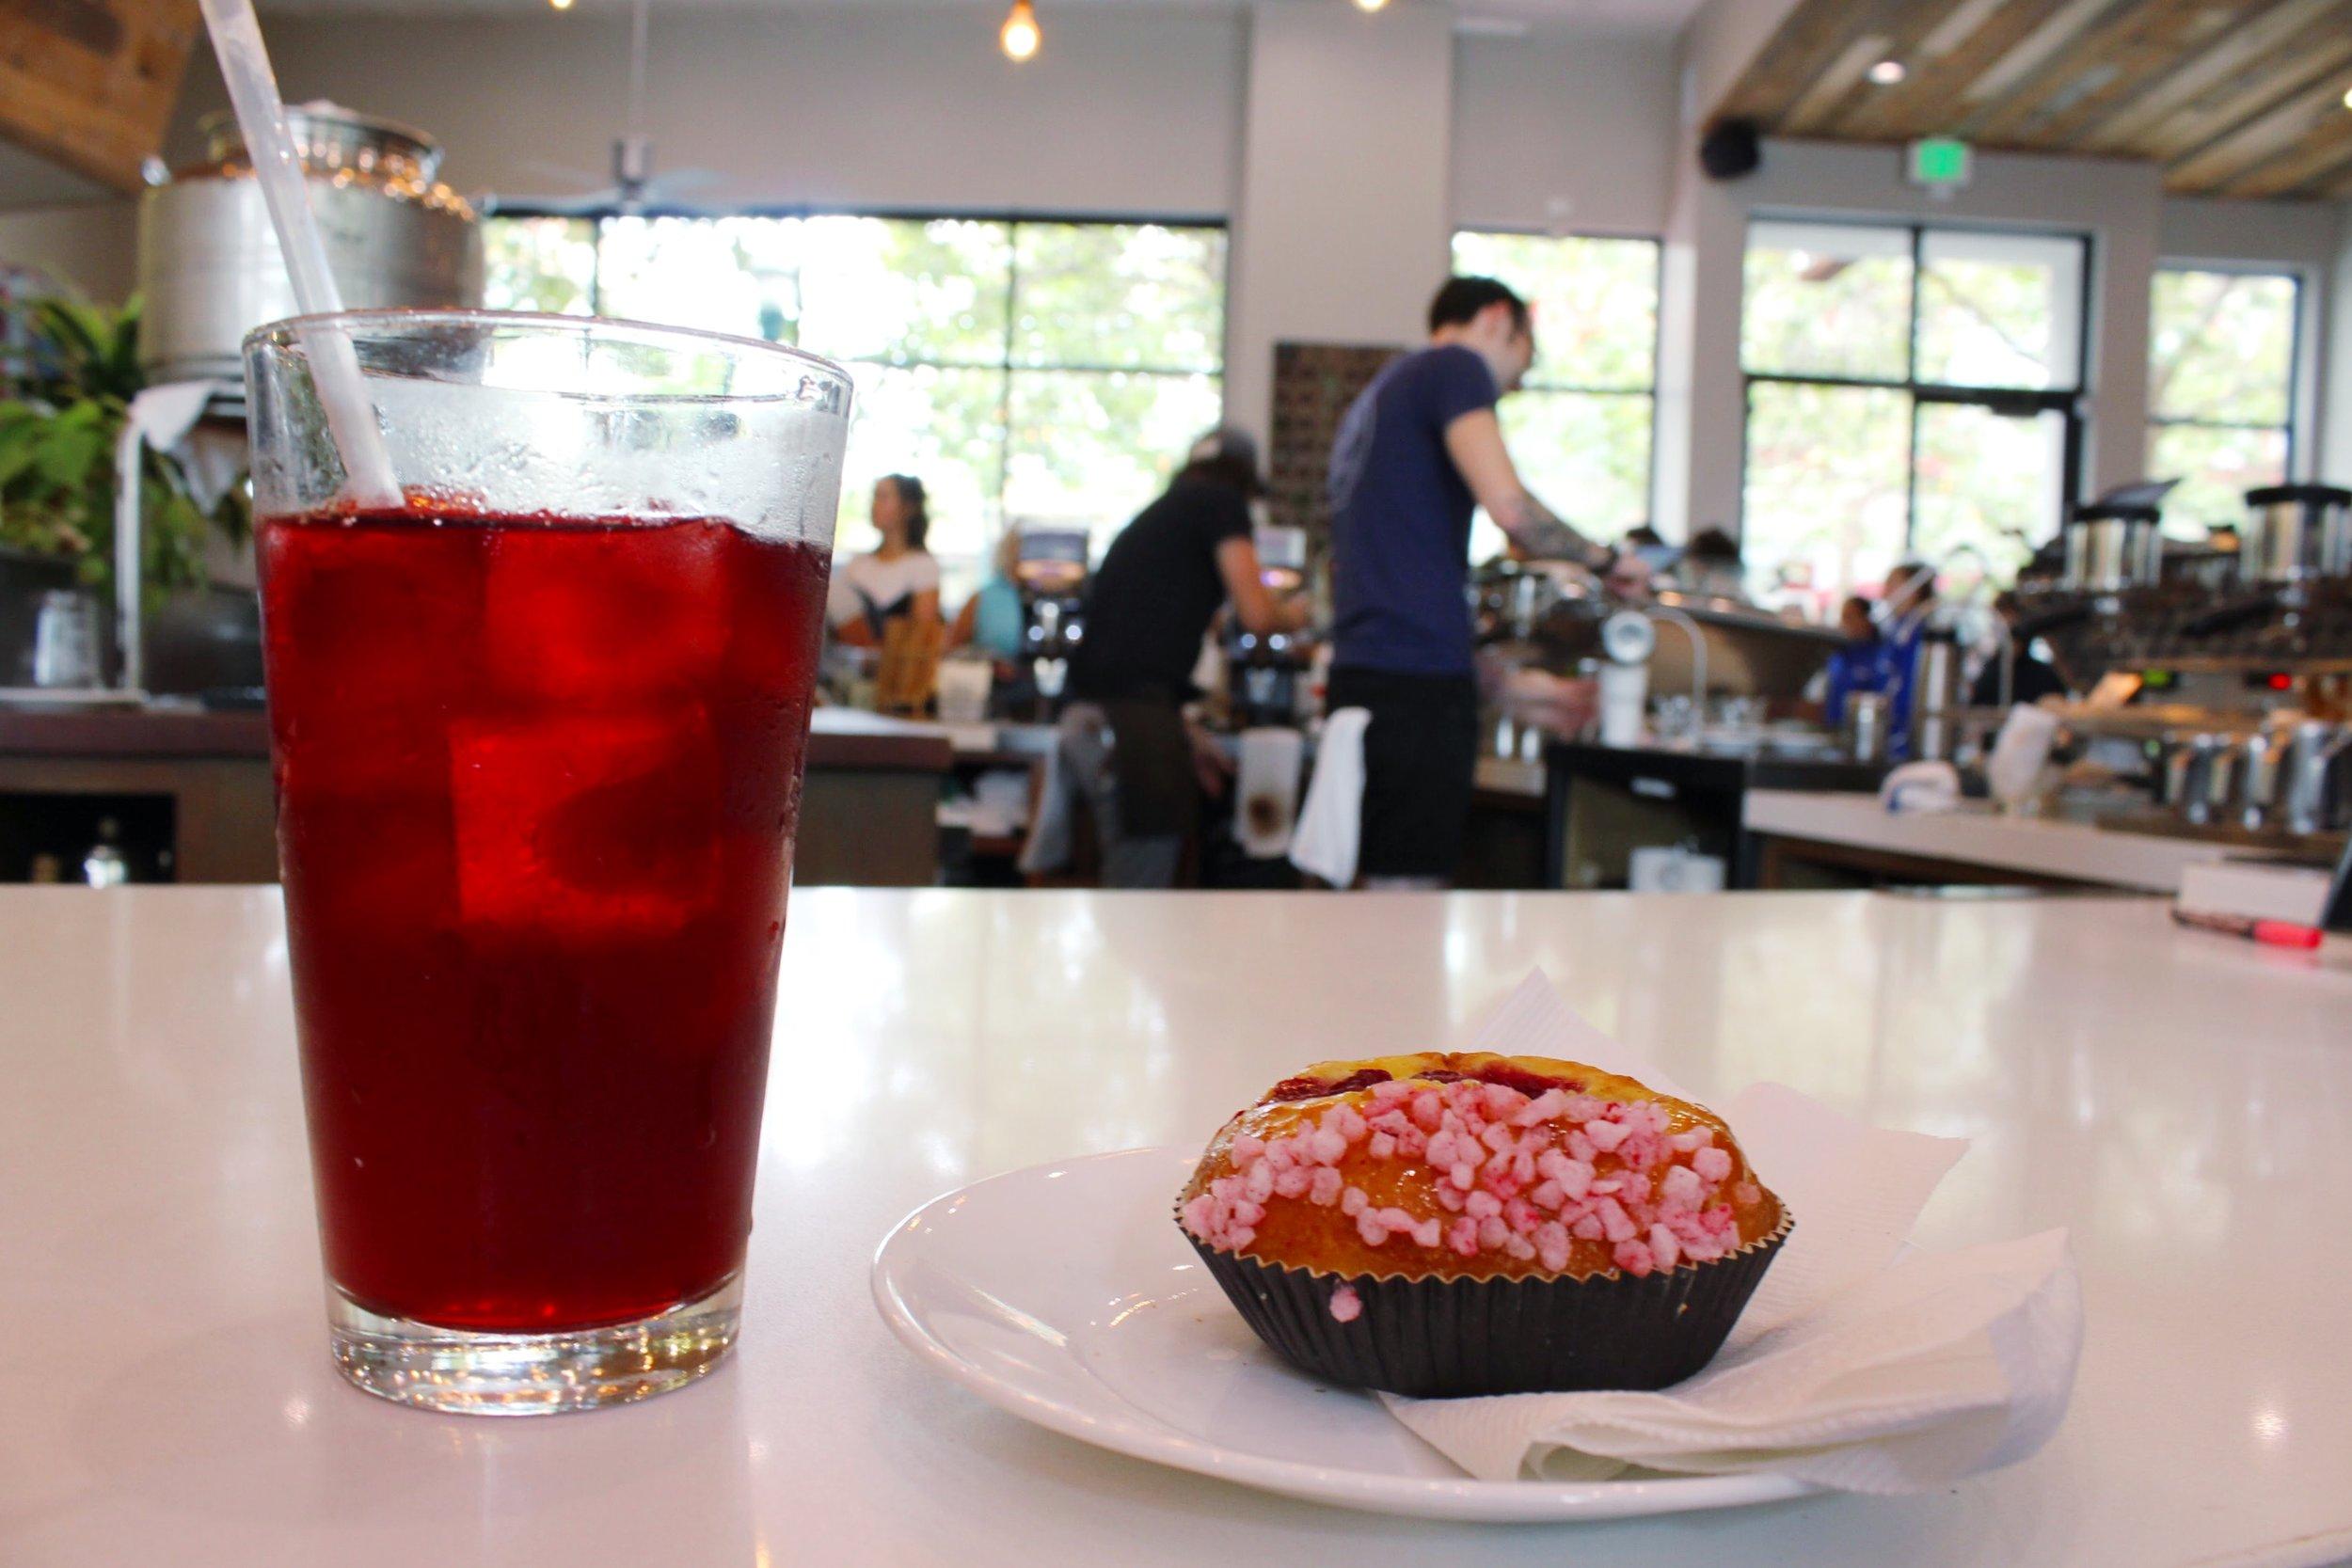 Sparkling Cascara and Raspberry Brioche from Verve Coffee Roasters in Santa Cruz